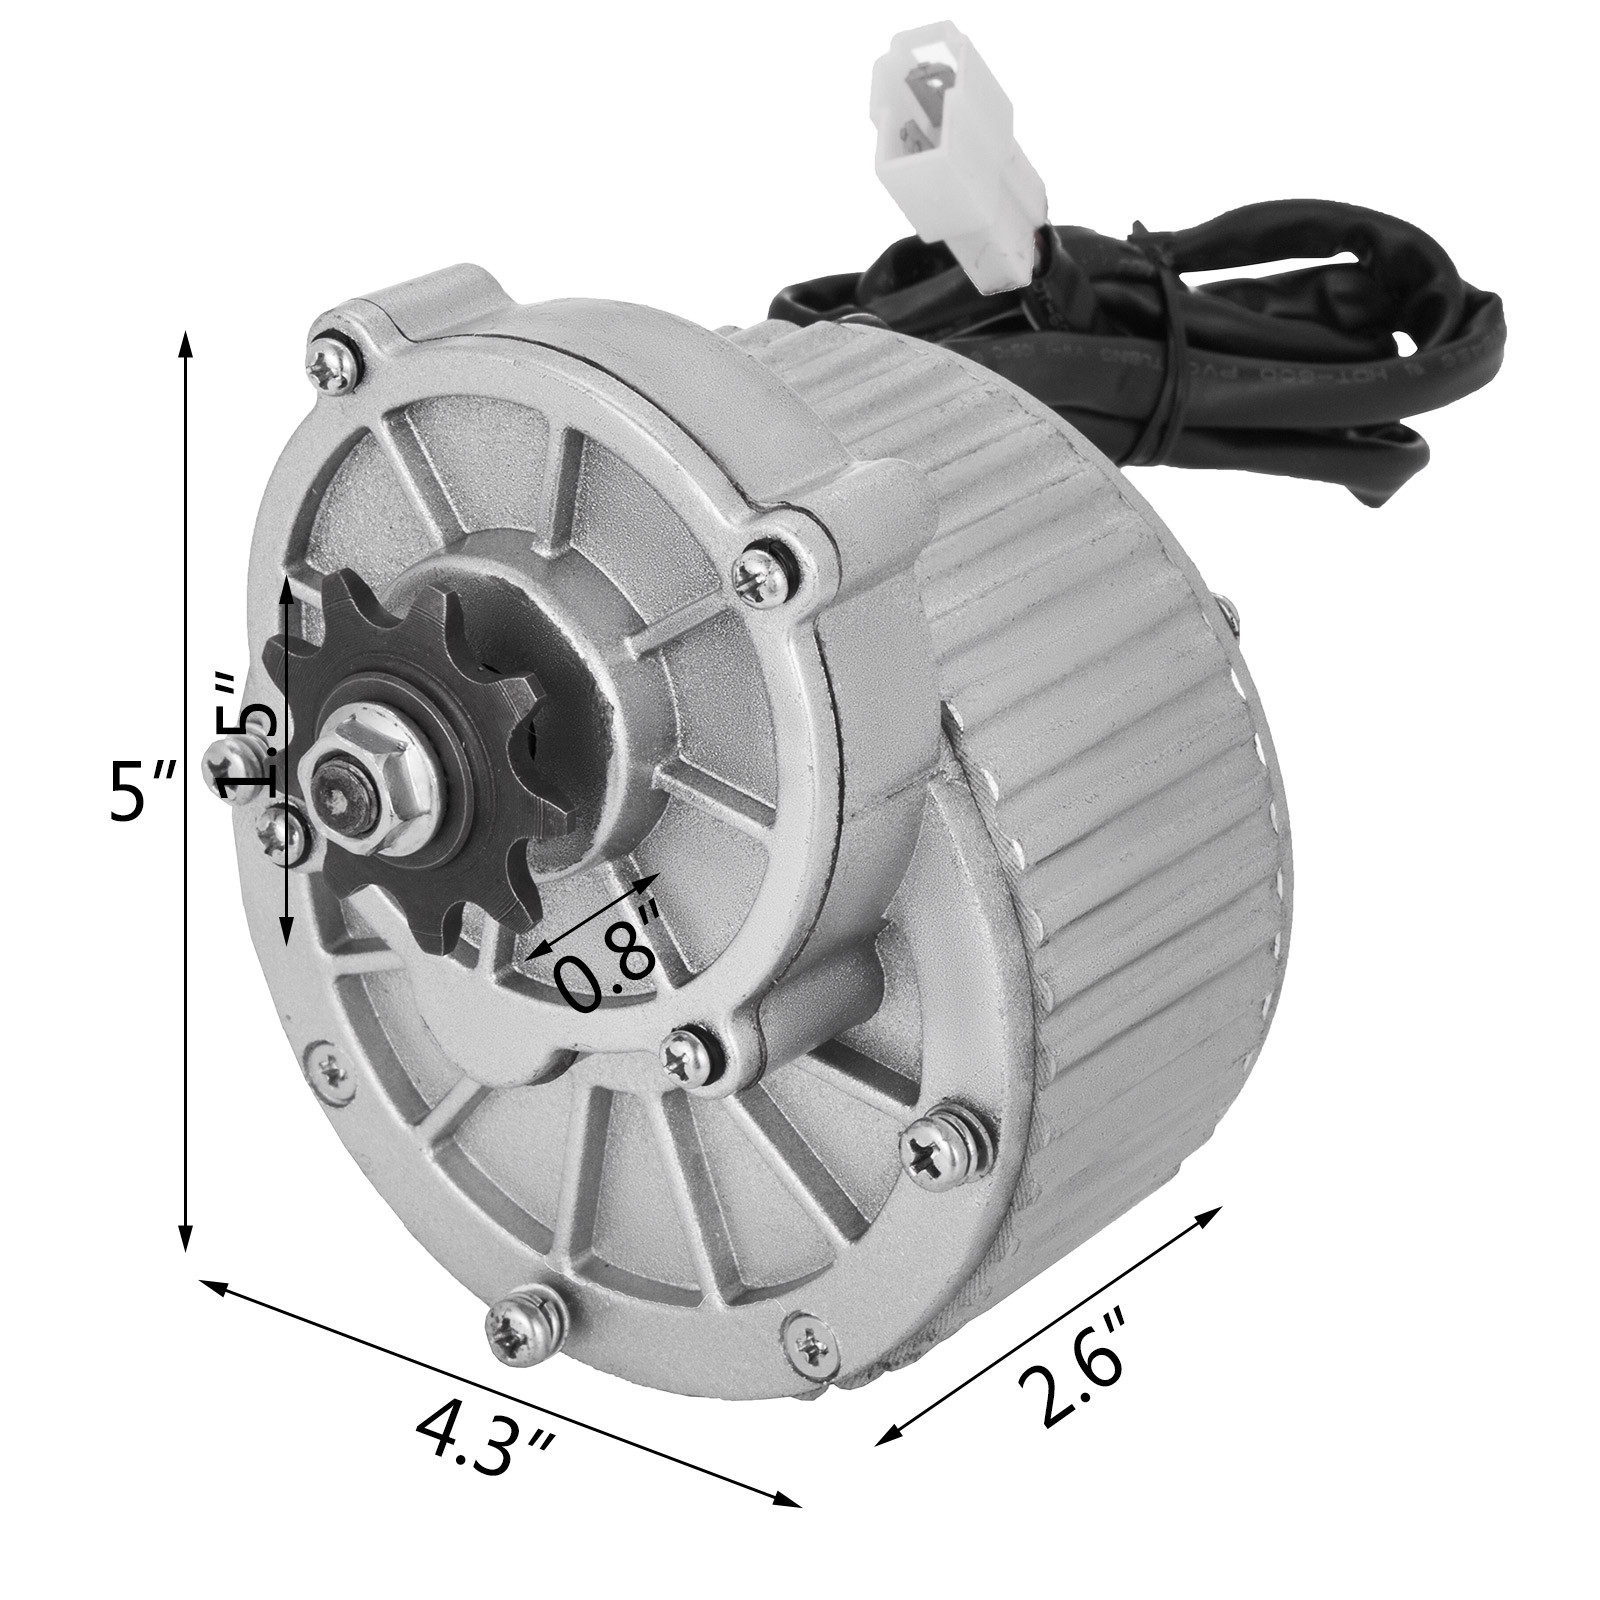 DC-electric-motor-12-60V-150W-2KW-for-scooter-bike-go-kart-minibike-e-ATV thumbnail 62